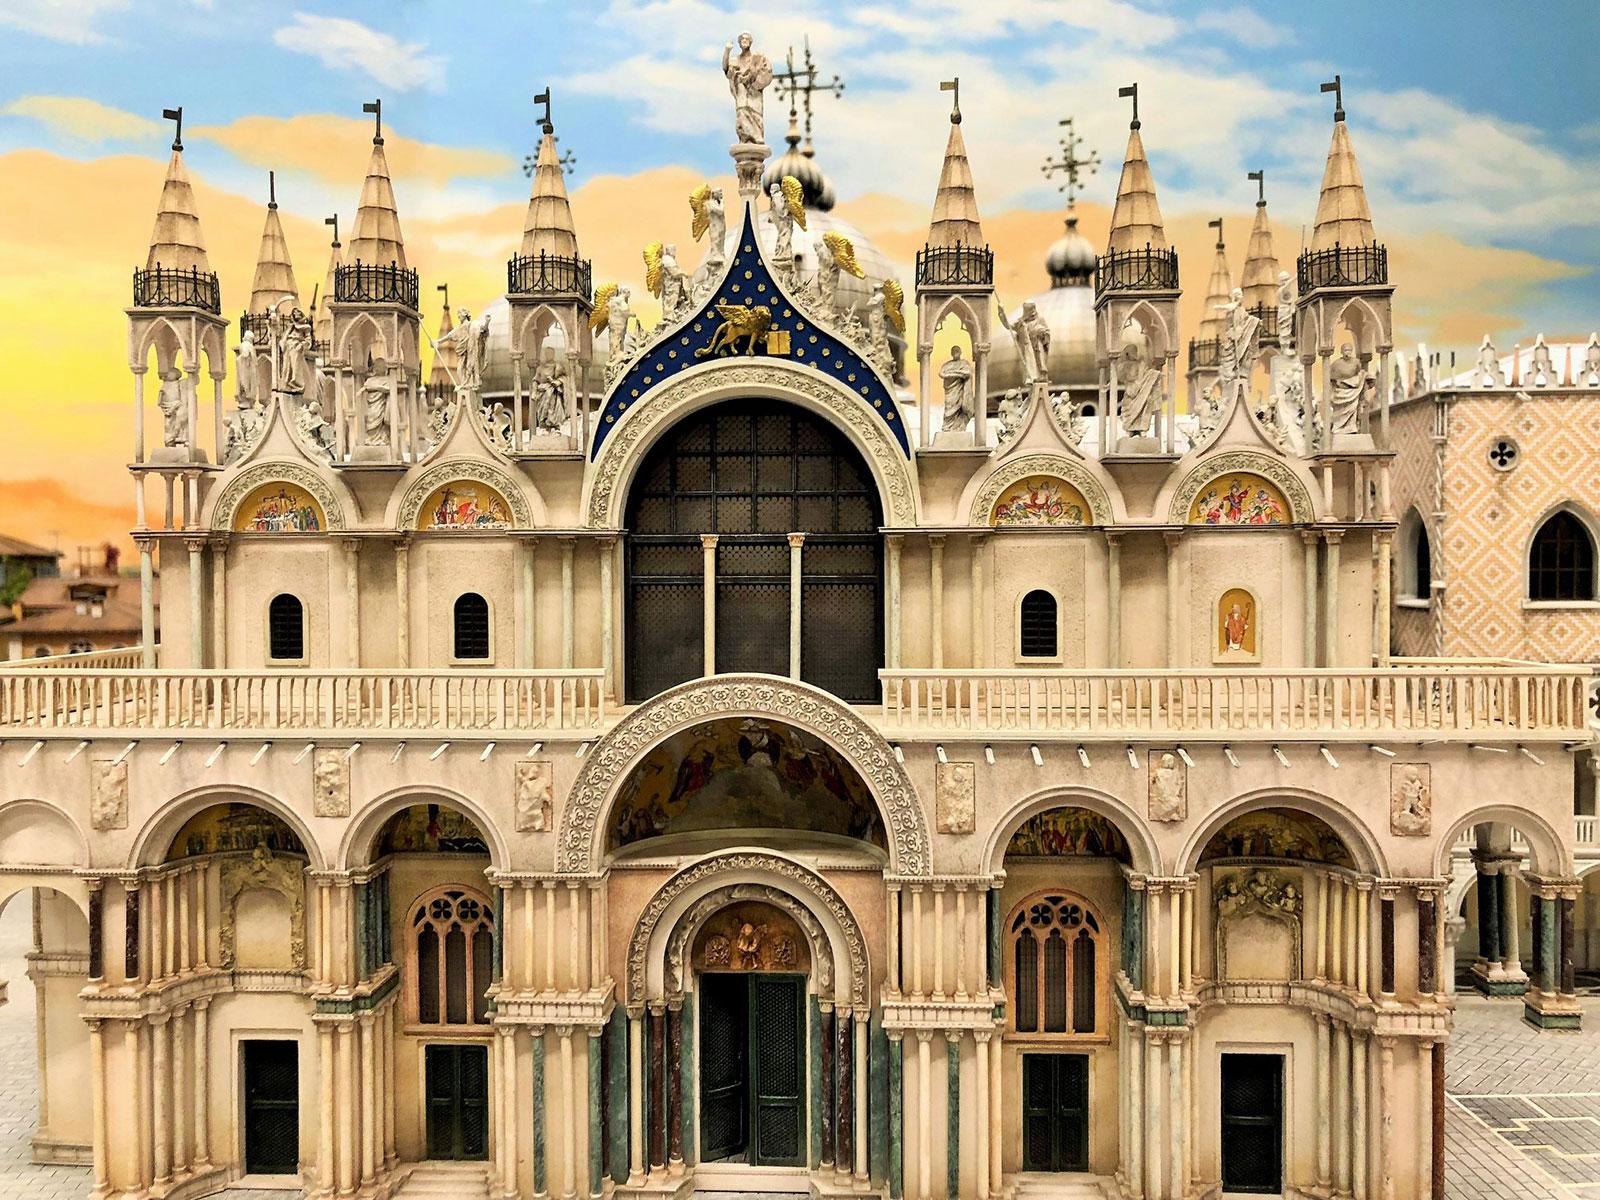 Der Touristenmagnet Hamburger Miniatur Wunderland proudly presents Venedig